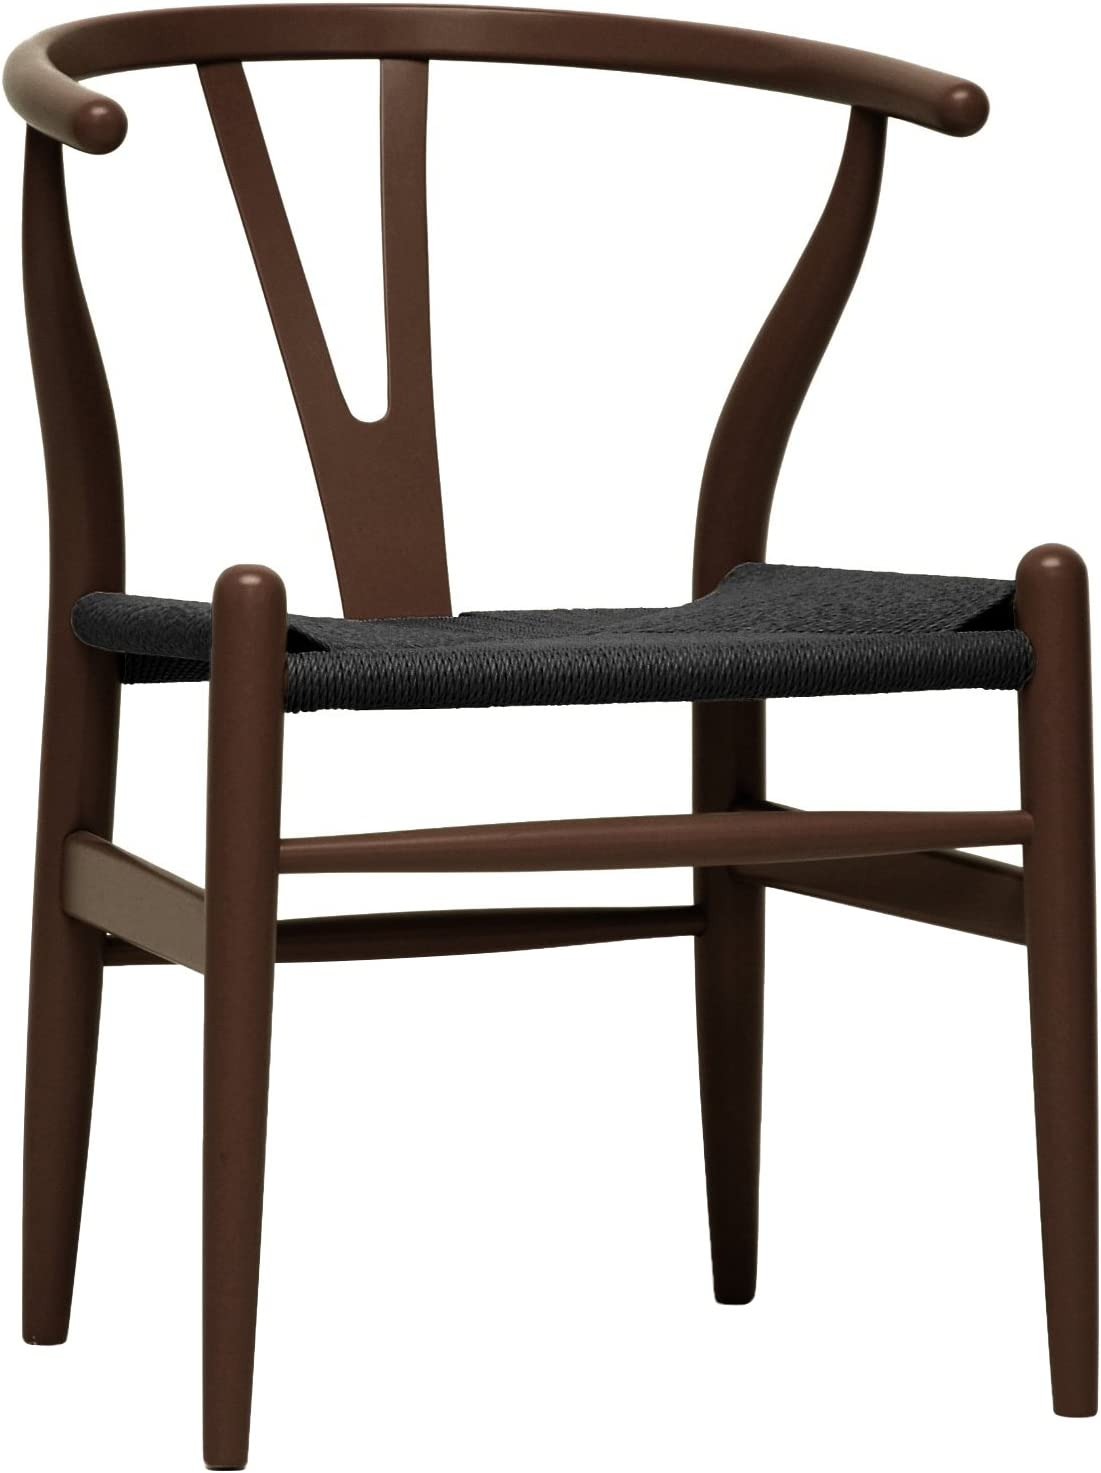 Amazon Com Baxton Studio Wishbone Chair Brown Wood Y Chair With Black Seat Furniture Decor